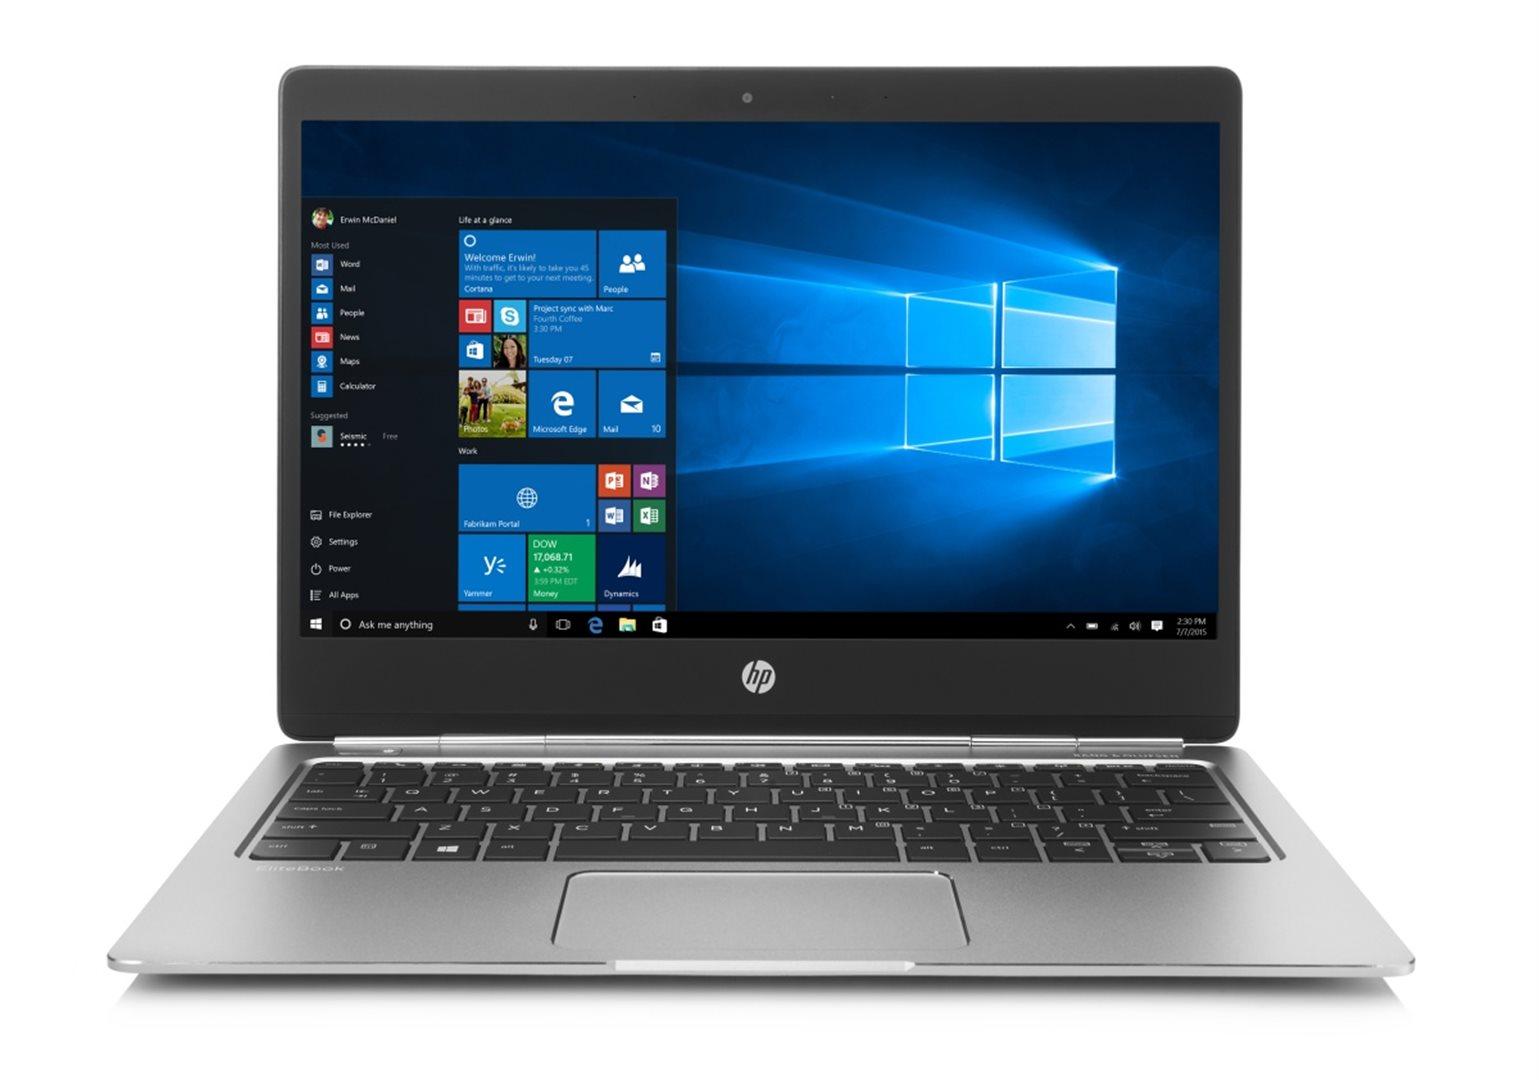 HP Folio G1 12.5 FHD /M5-6Y54/8G/256SSD/HDMI/MCR/WIFI/BT/NFC/MCR/FPR/3Rservis/W10P